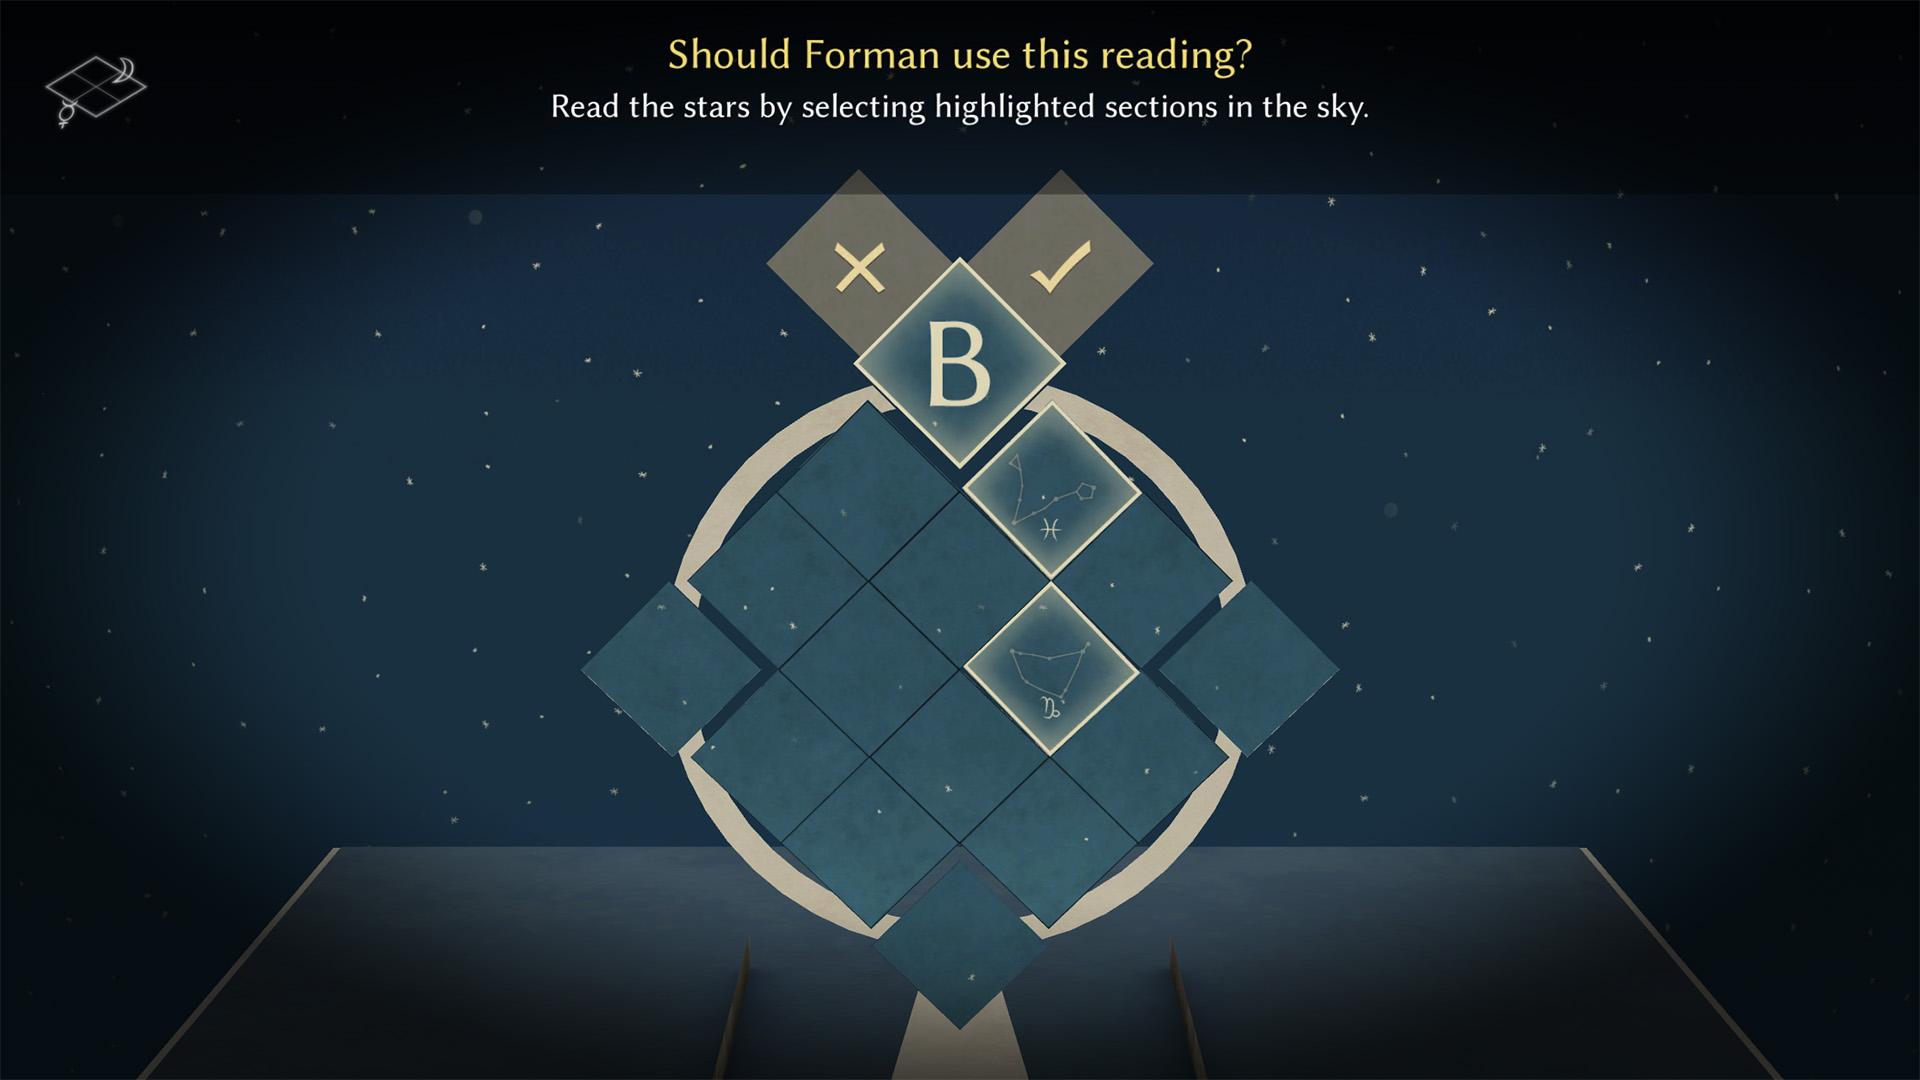 ReadingB.jpg